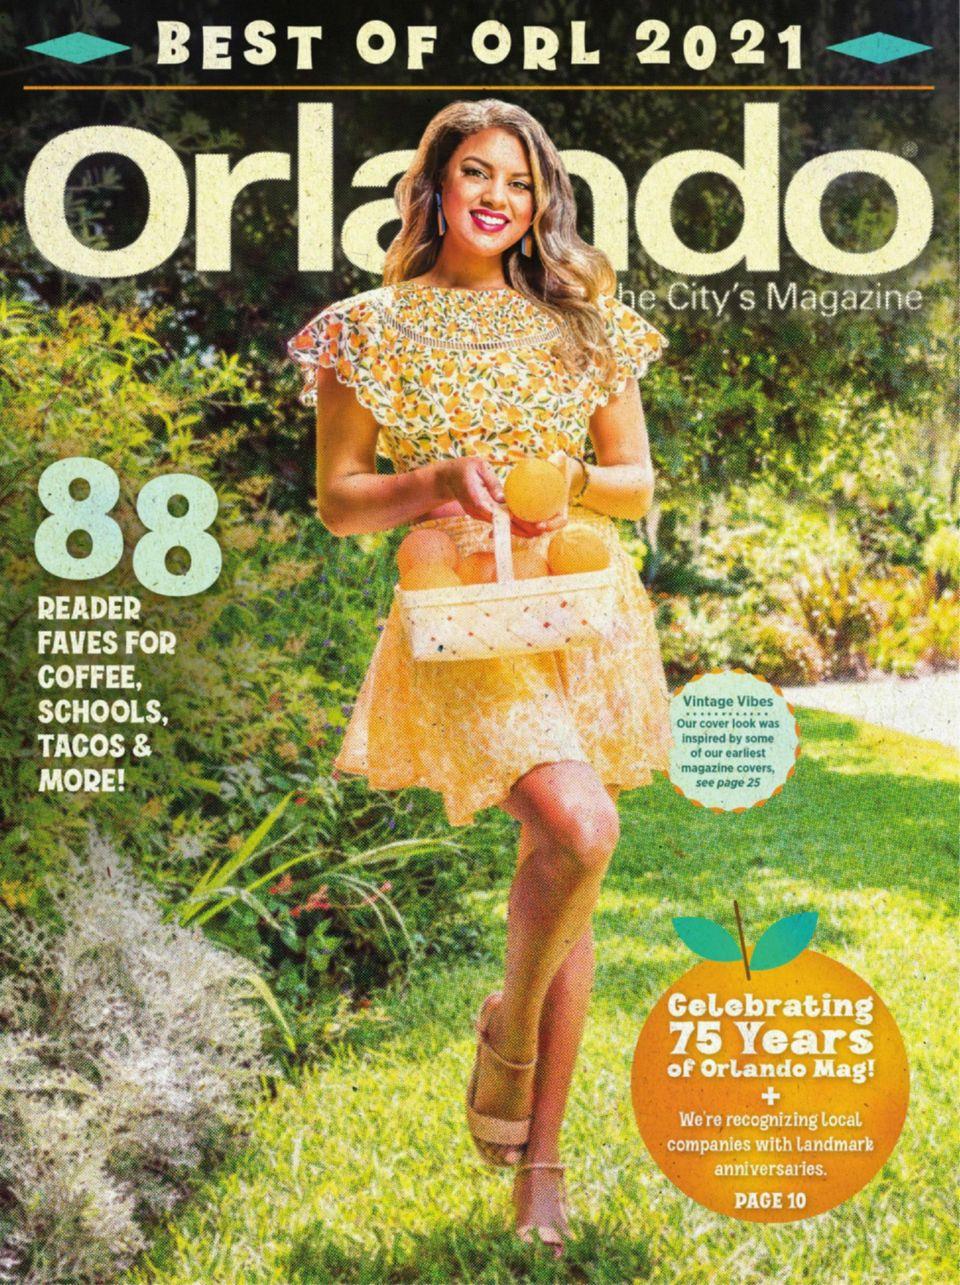 Rey Homes Voted Top 3 Best Home Builder in Orlando